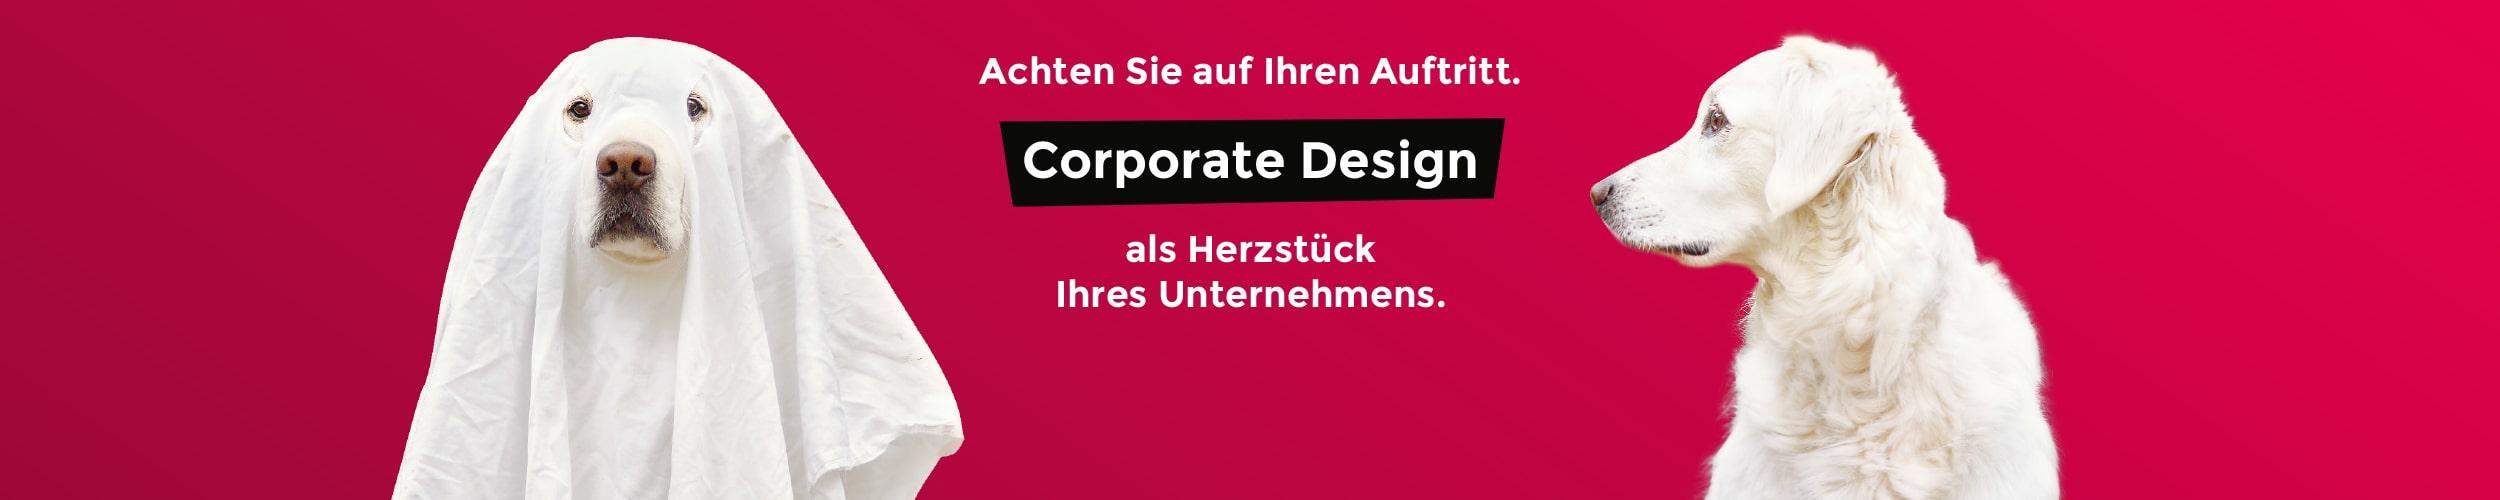 purpix - Corporate-Design